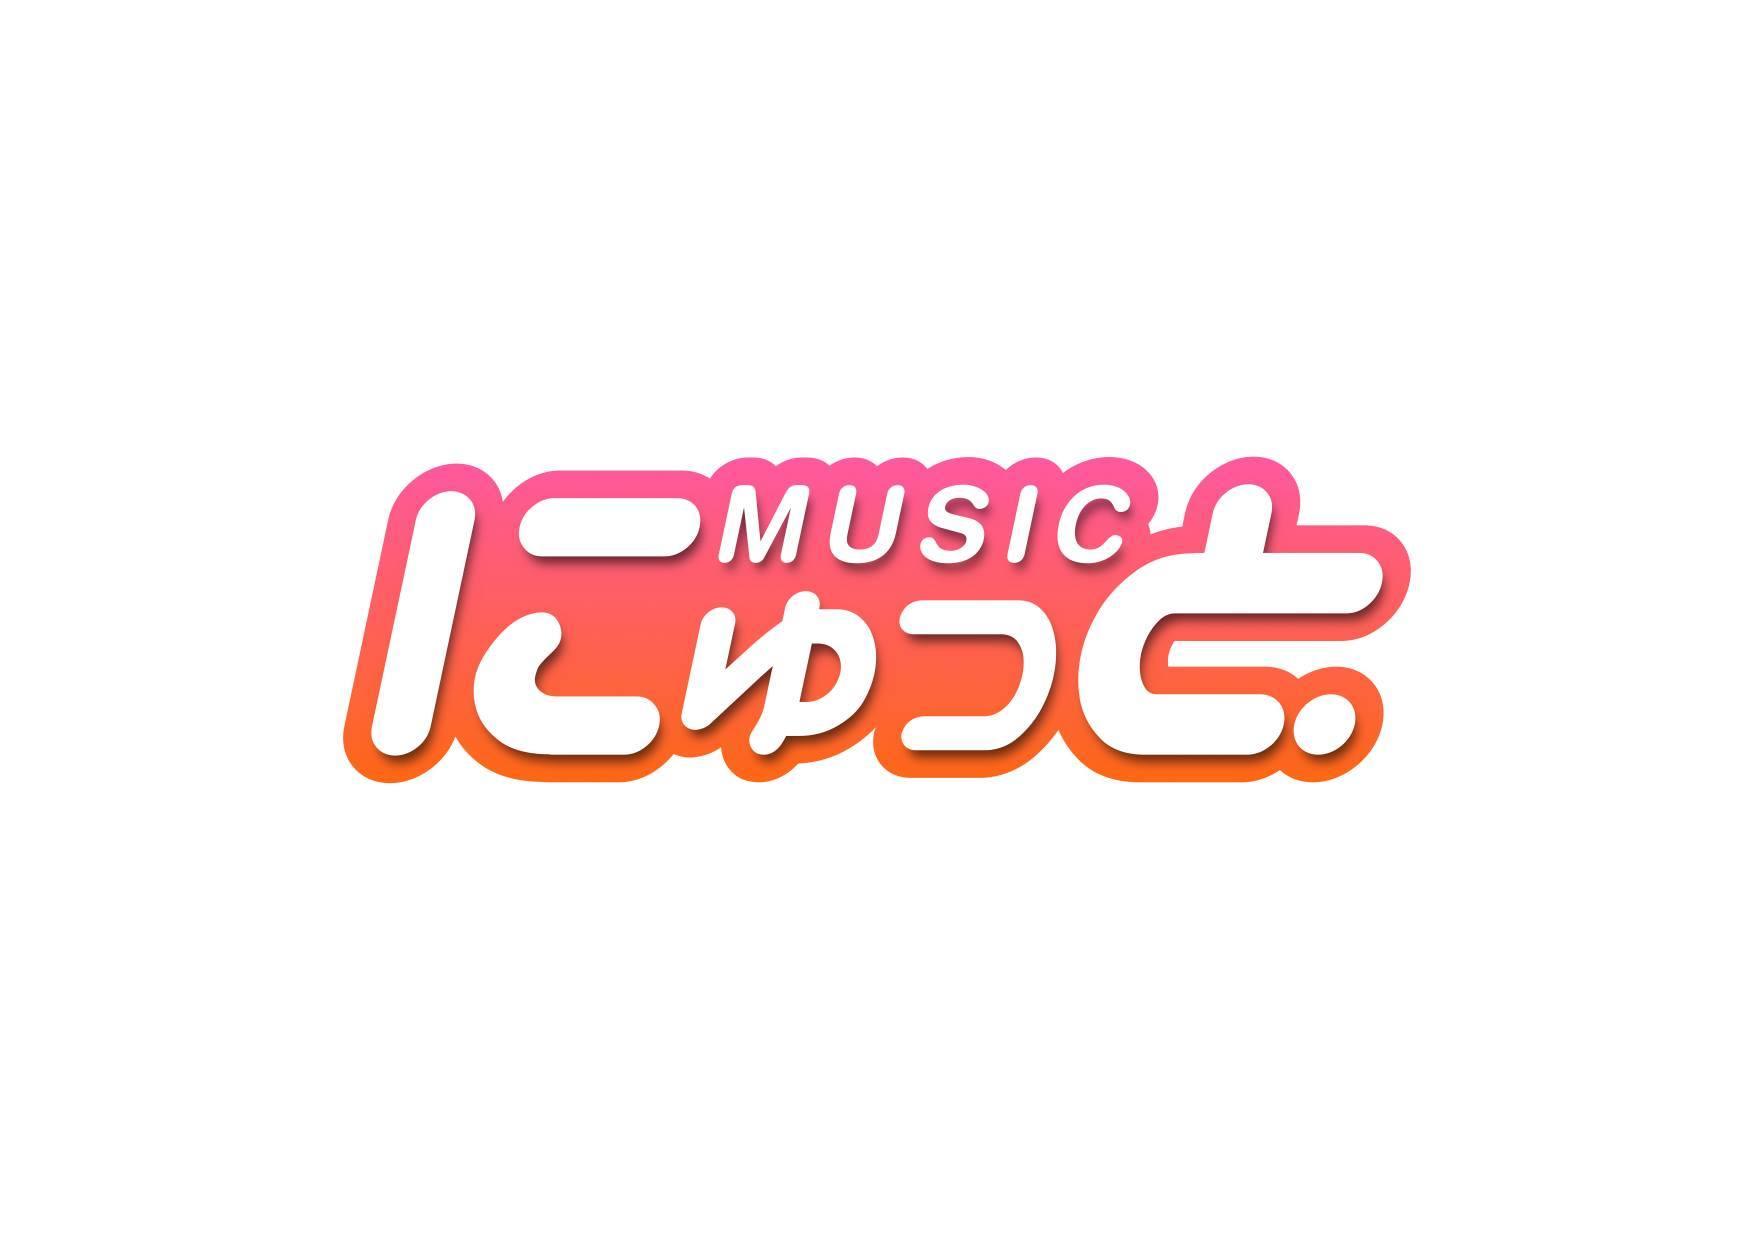 musicnyt